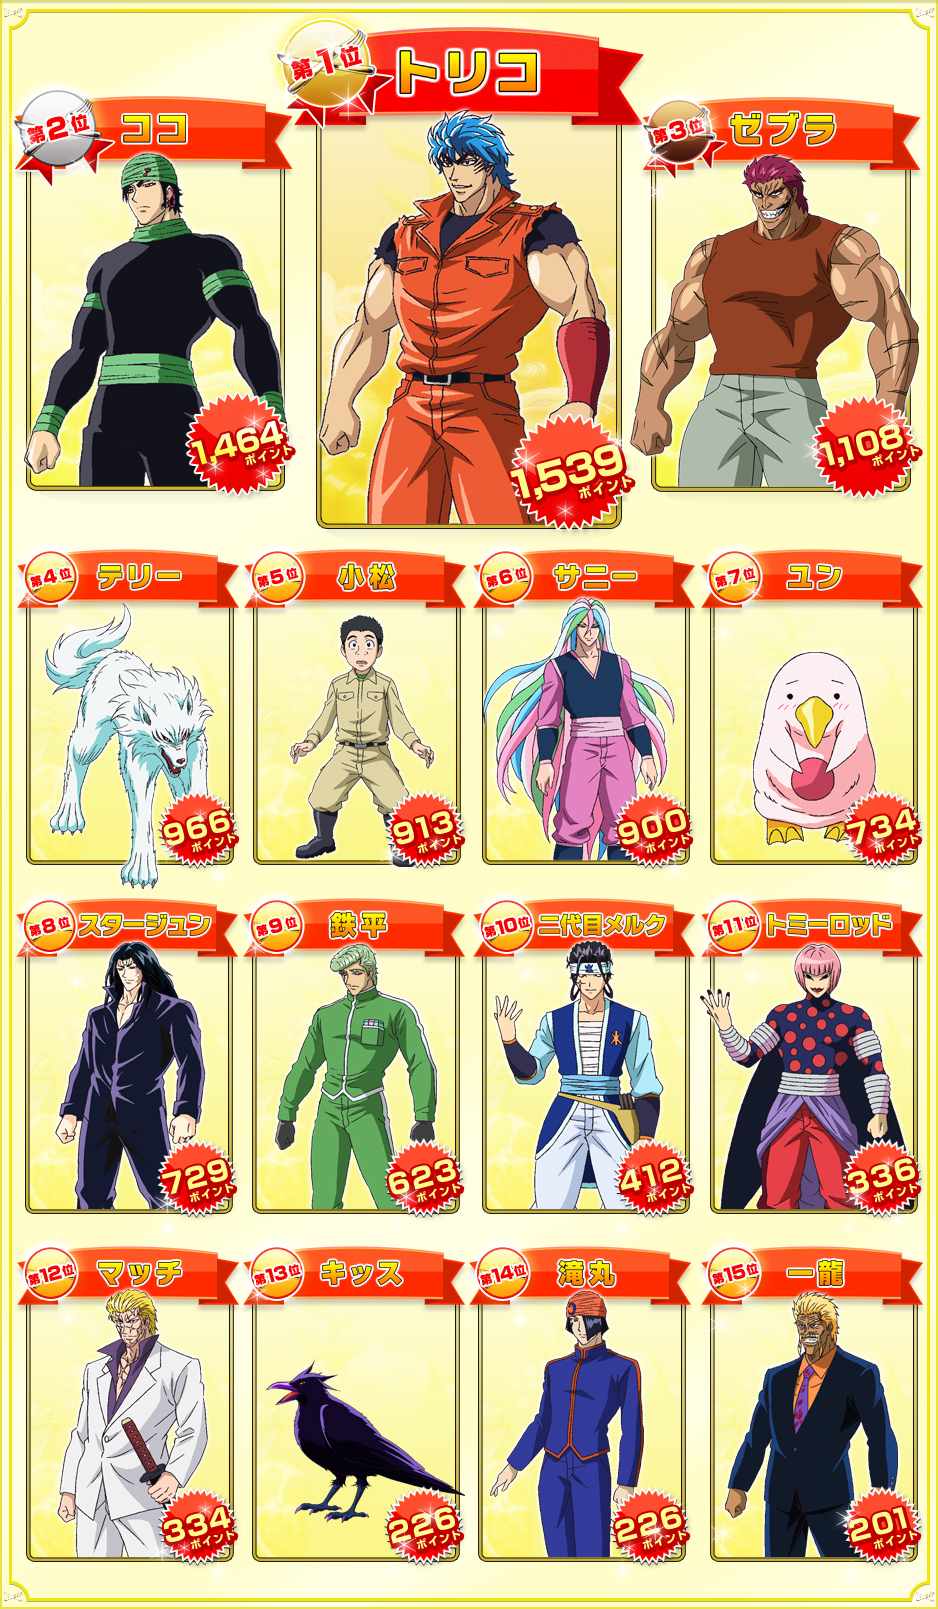 Anime Characters Popularity Poll : Popularity poll toriko wiki